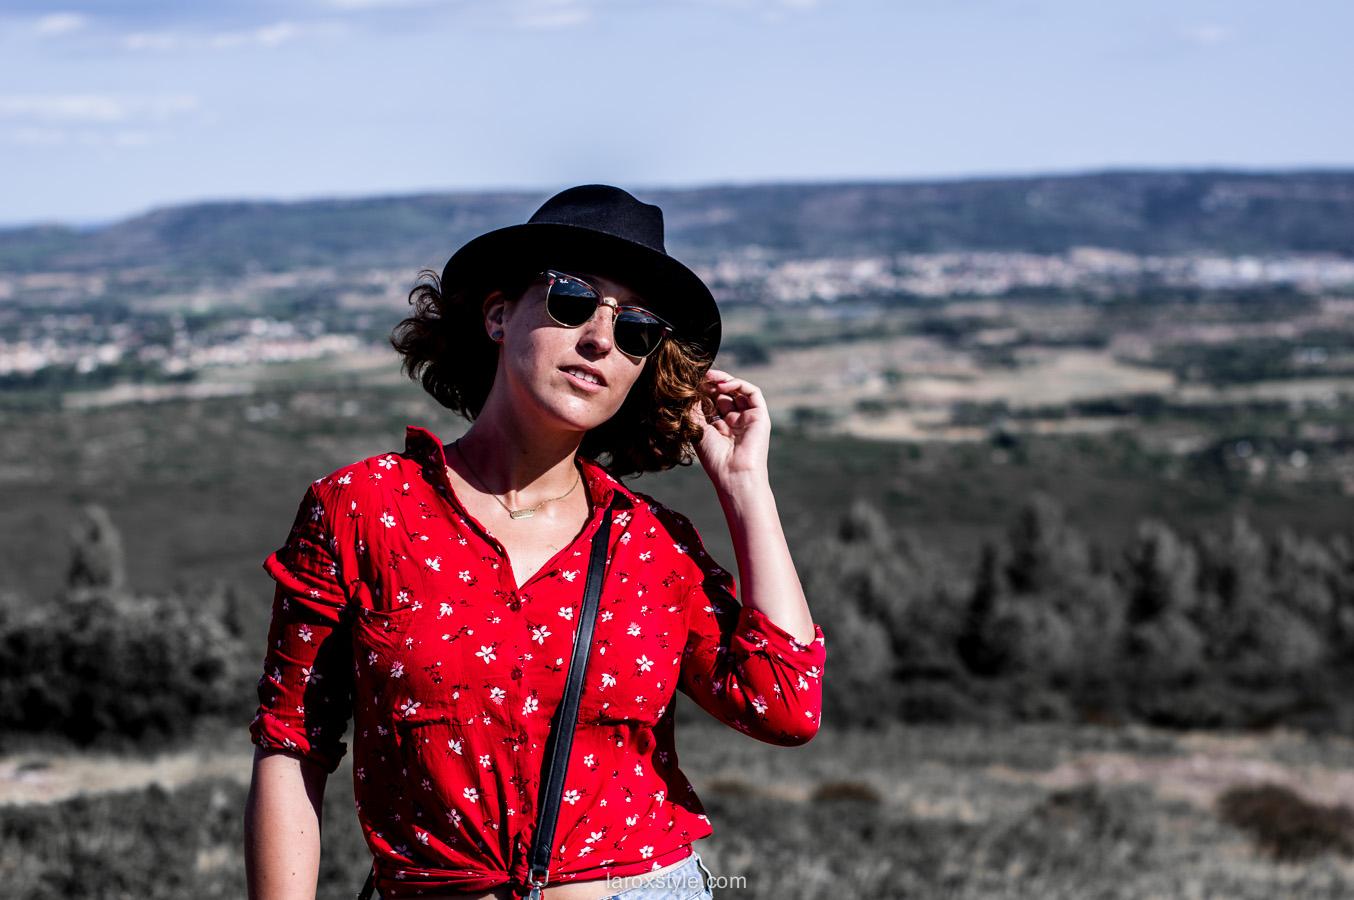 porter le chapeau - blog mode lyon - laroxstyle